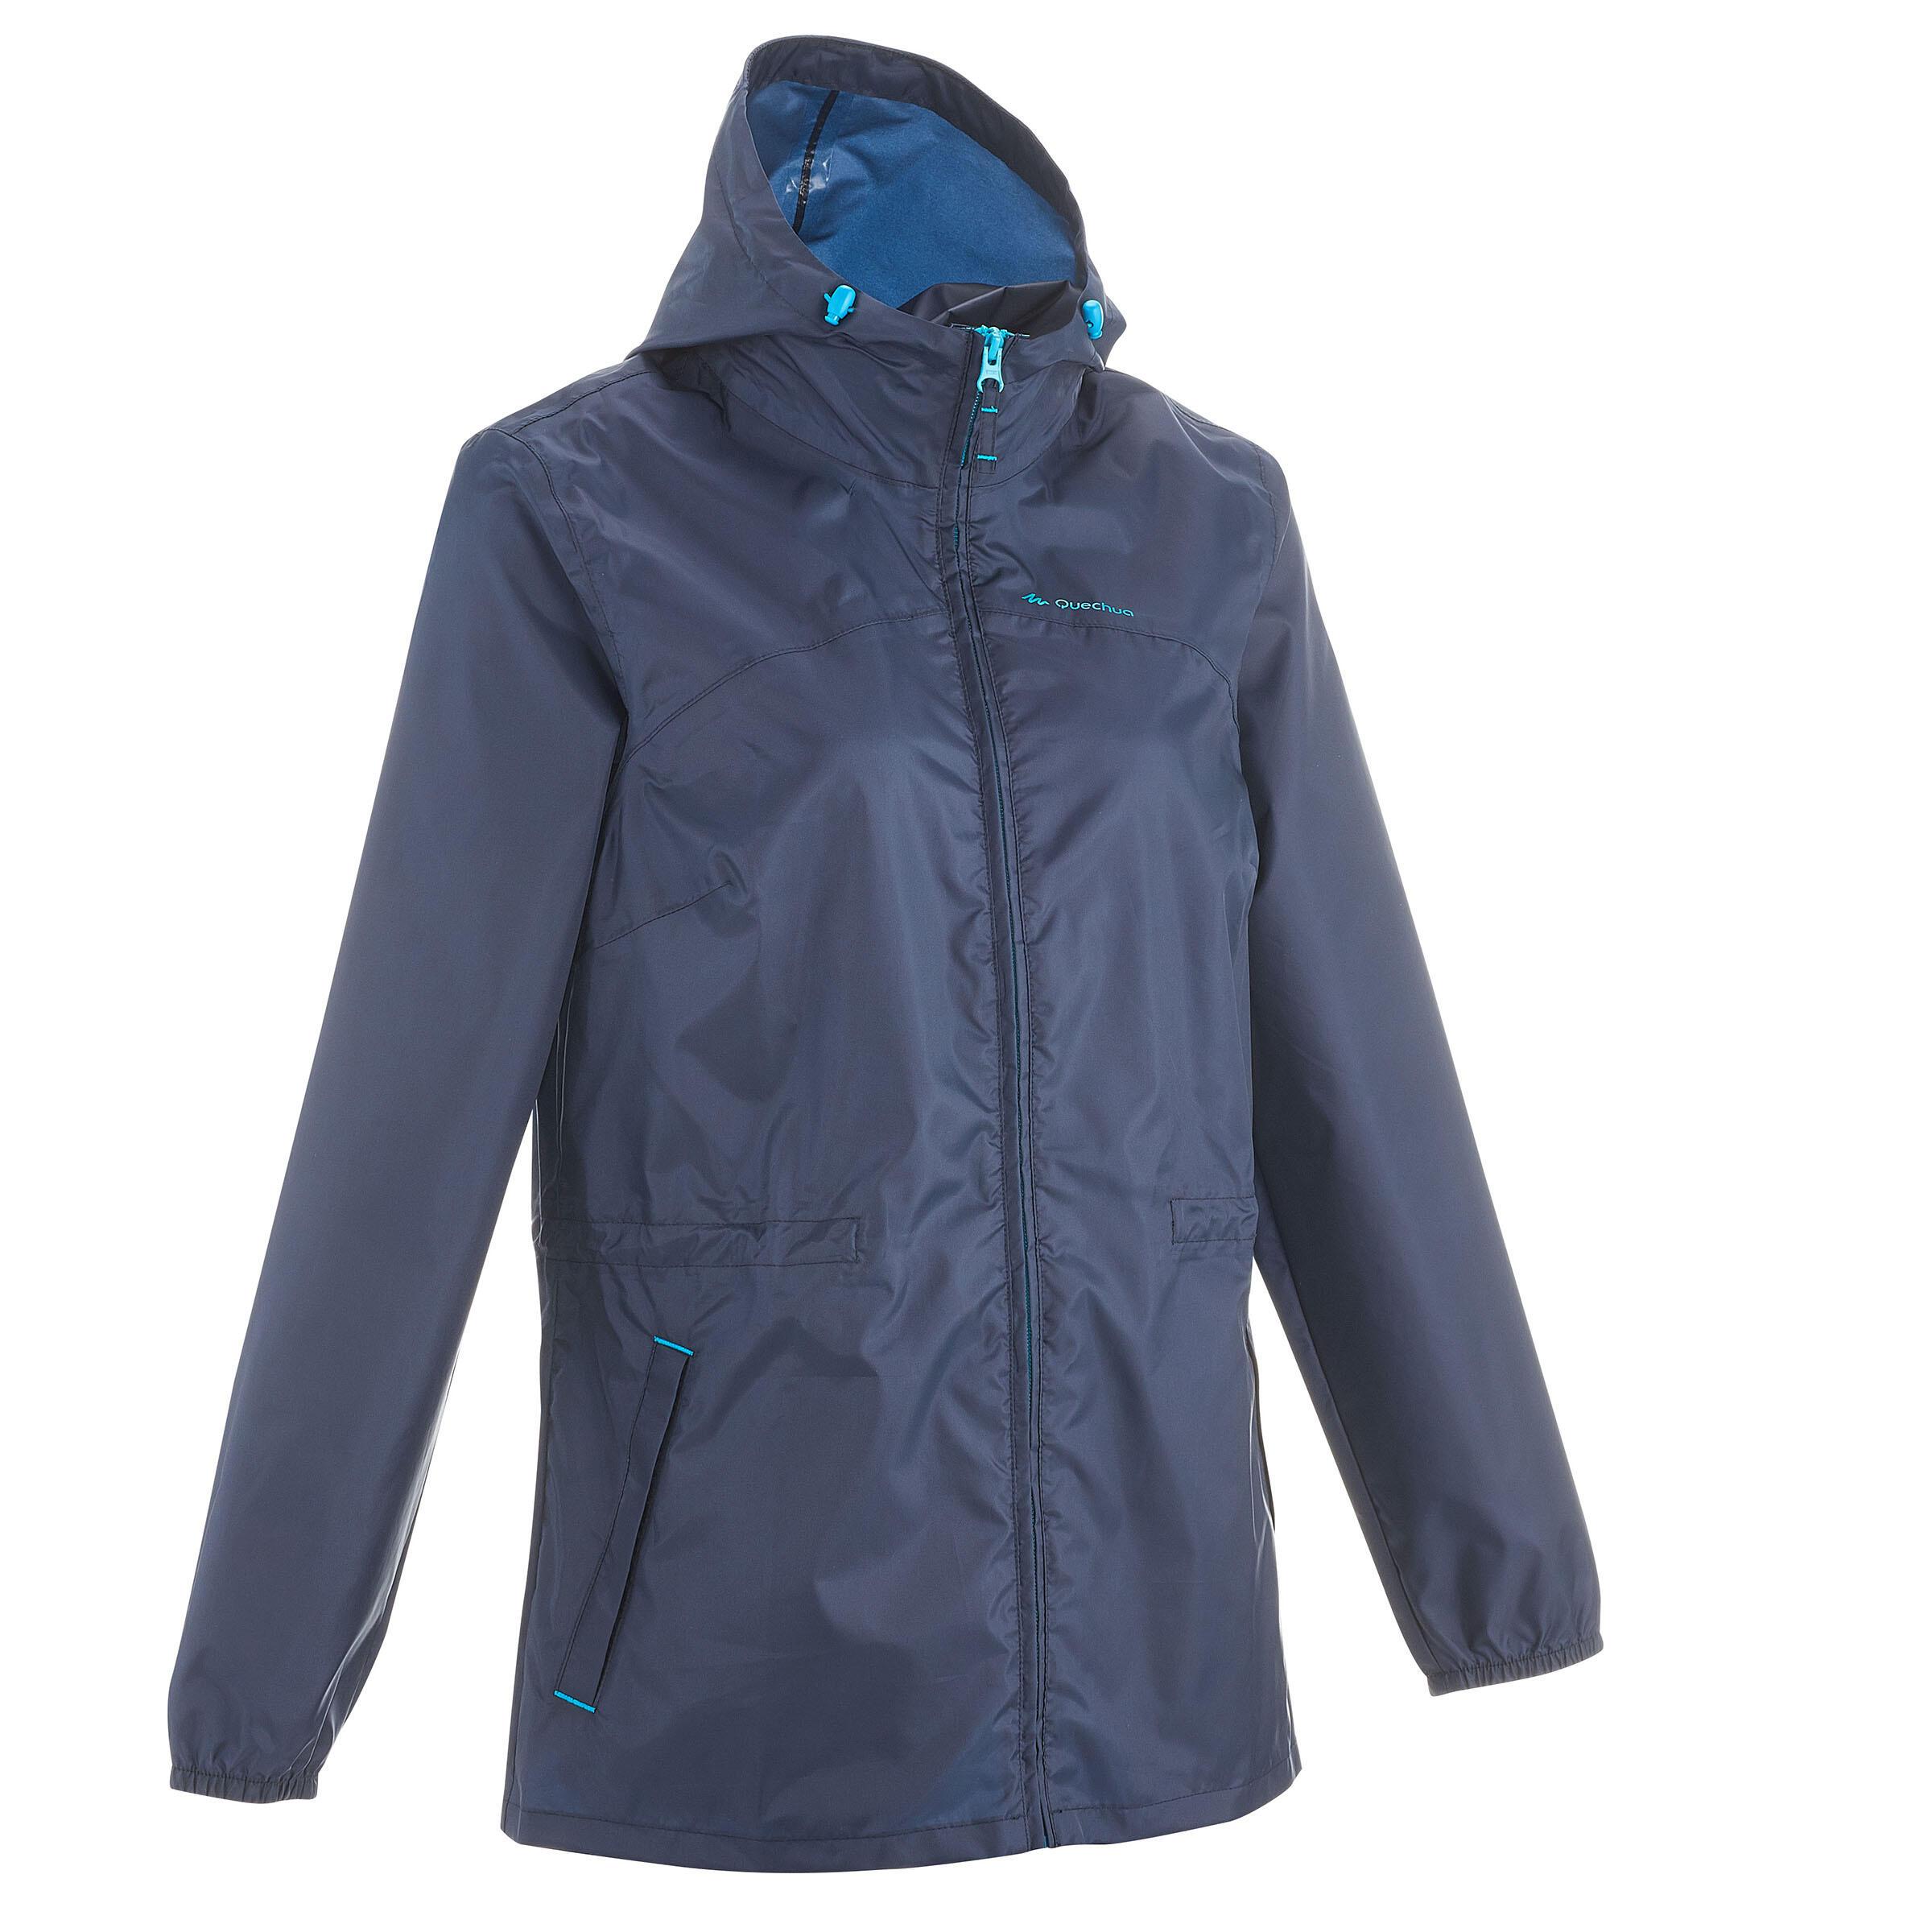 Regenjacke Raincut NH100 wasserdicht Reißverschluss Damen marineblau | Sportbekleidung > Sportjacken > Regenjacken | Blau | Quechua